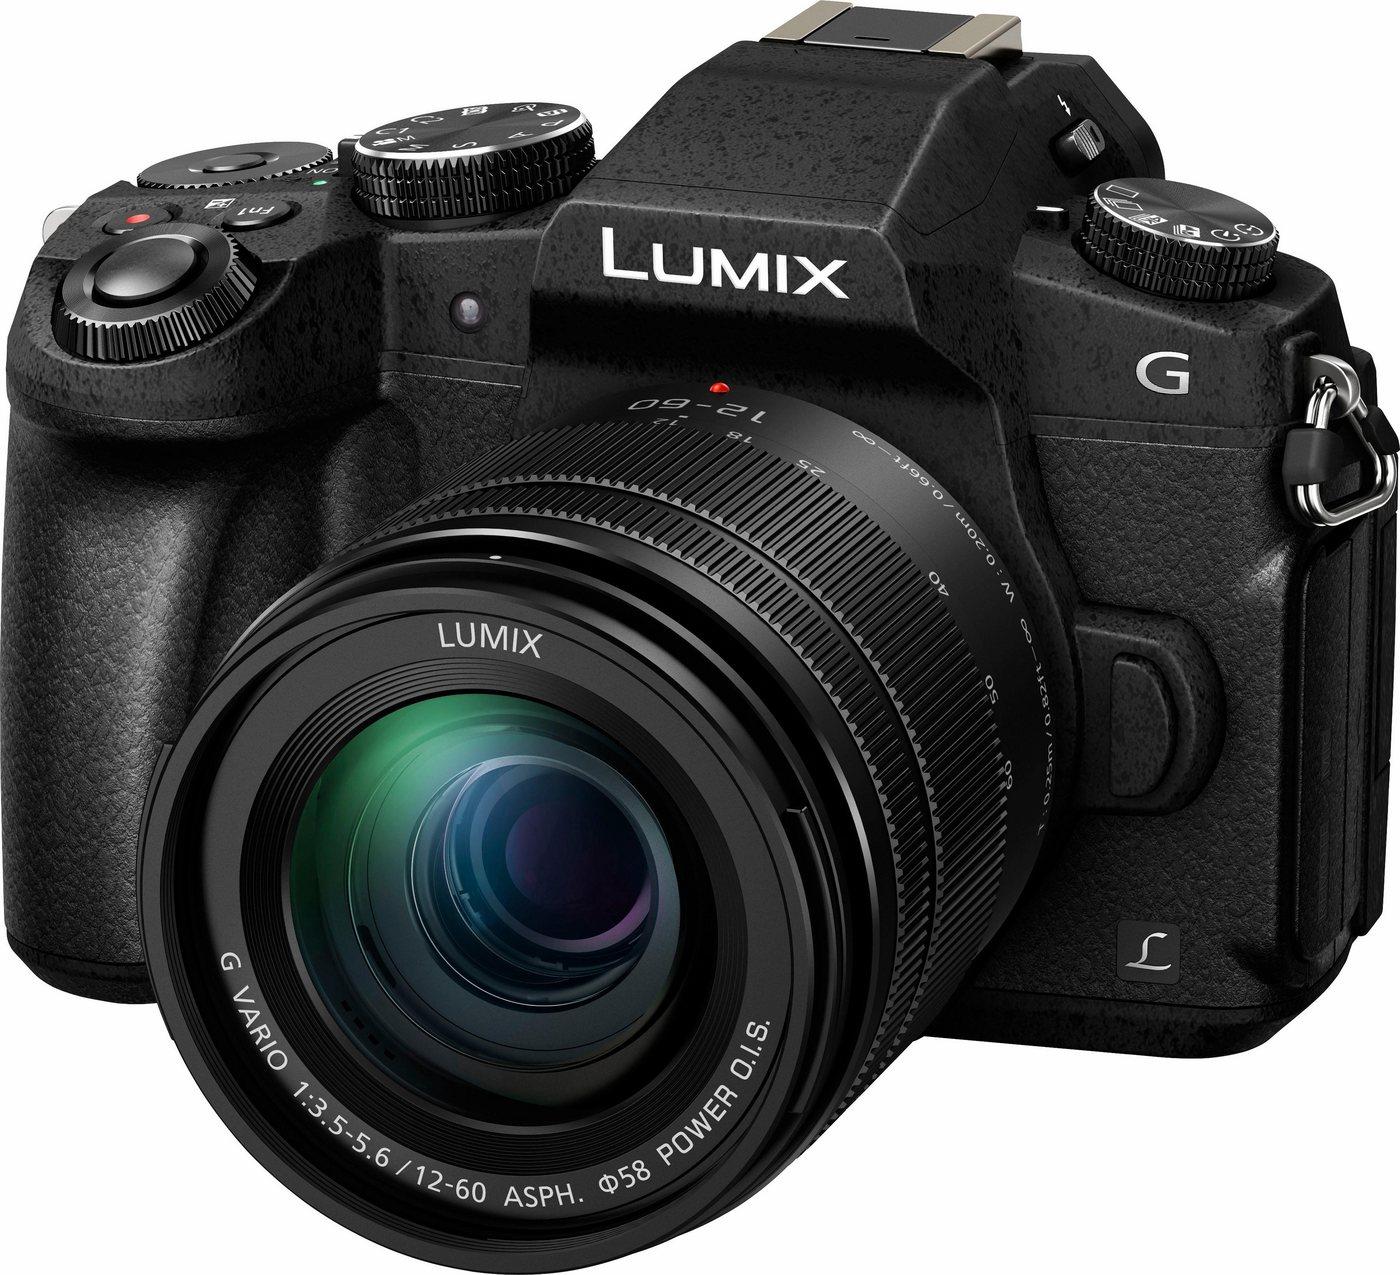 Systemkameras - Lumix Panasonic »DMC G81MEG K« Systemkamera (LUMIX G VARIO 12 60mm F3.5 5.6, 16 MP, Gesichtserkennung, Panorama Modus)  - Onlineshop OTTO